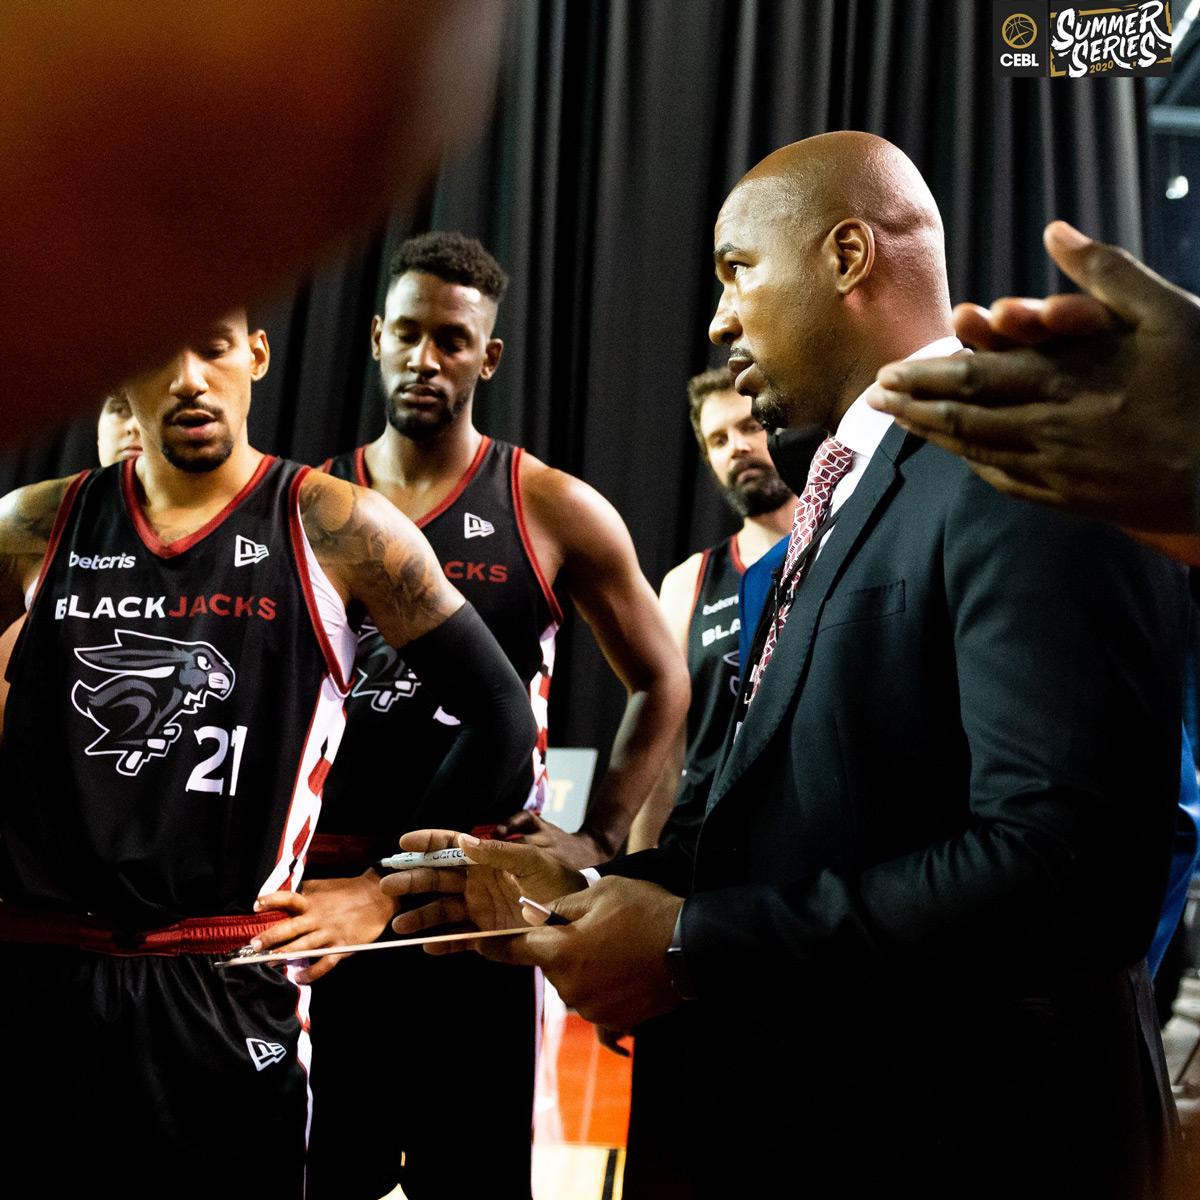 Ottawa Blackjacks Head Coach Osvaldo Jeanty Giving Out Instructions